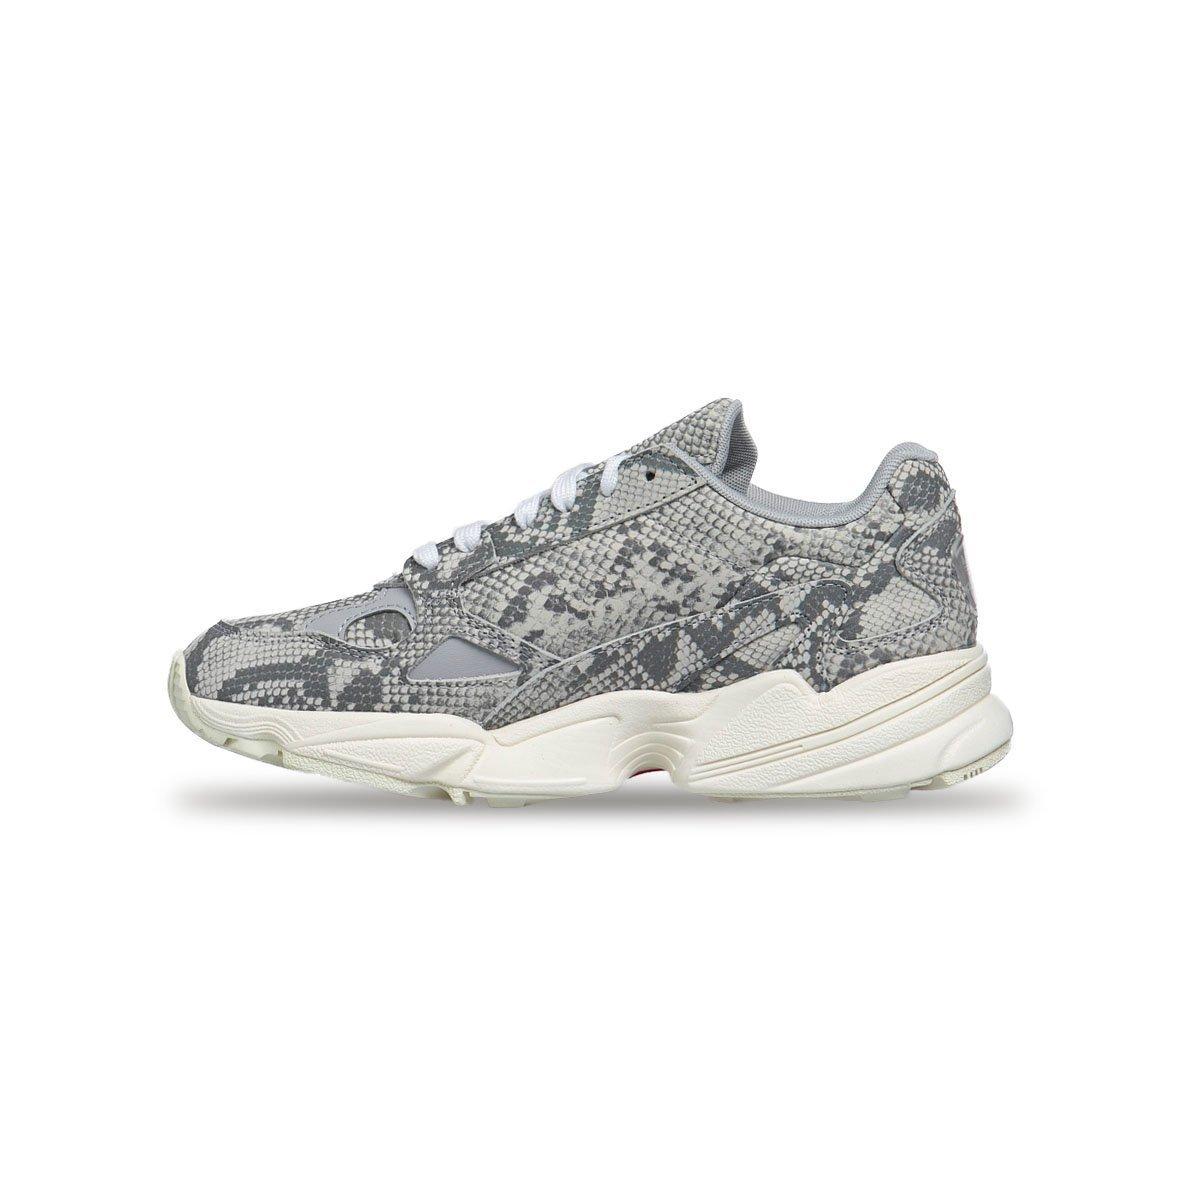 Sneakers WMNS Adidas Originals Falcon W